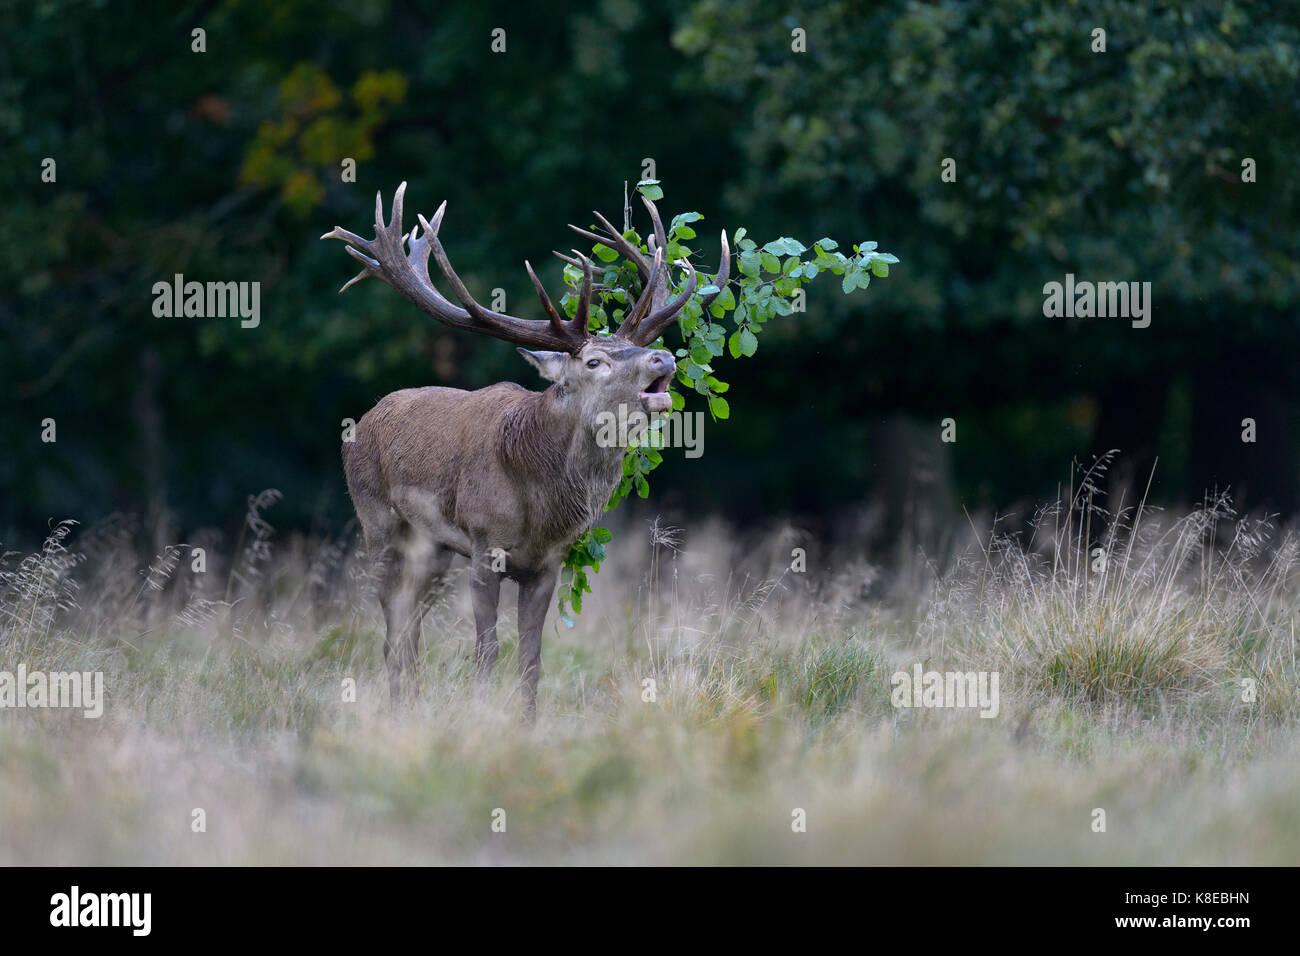 Il cervo (Cervus elaphus), ruggito, capitale stag con fogliame in corna imponierge, platzhirsch, zelanda, Danimarca Immagini Stock